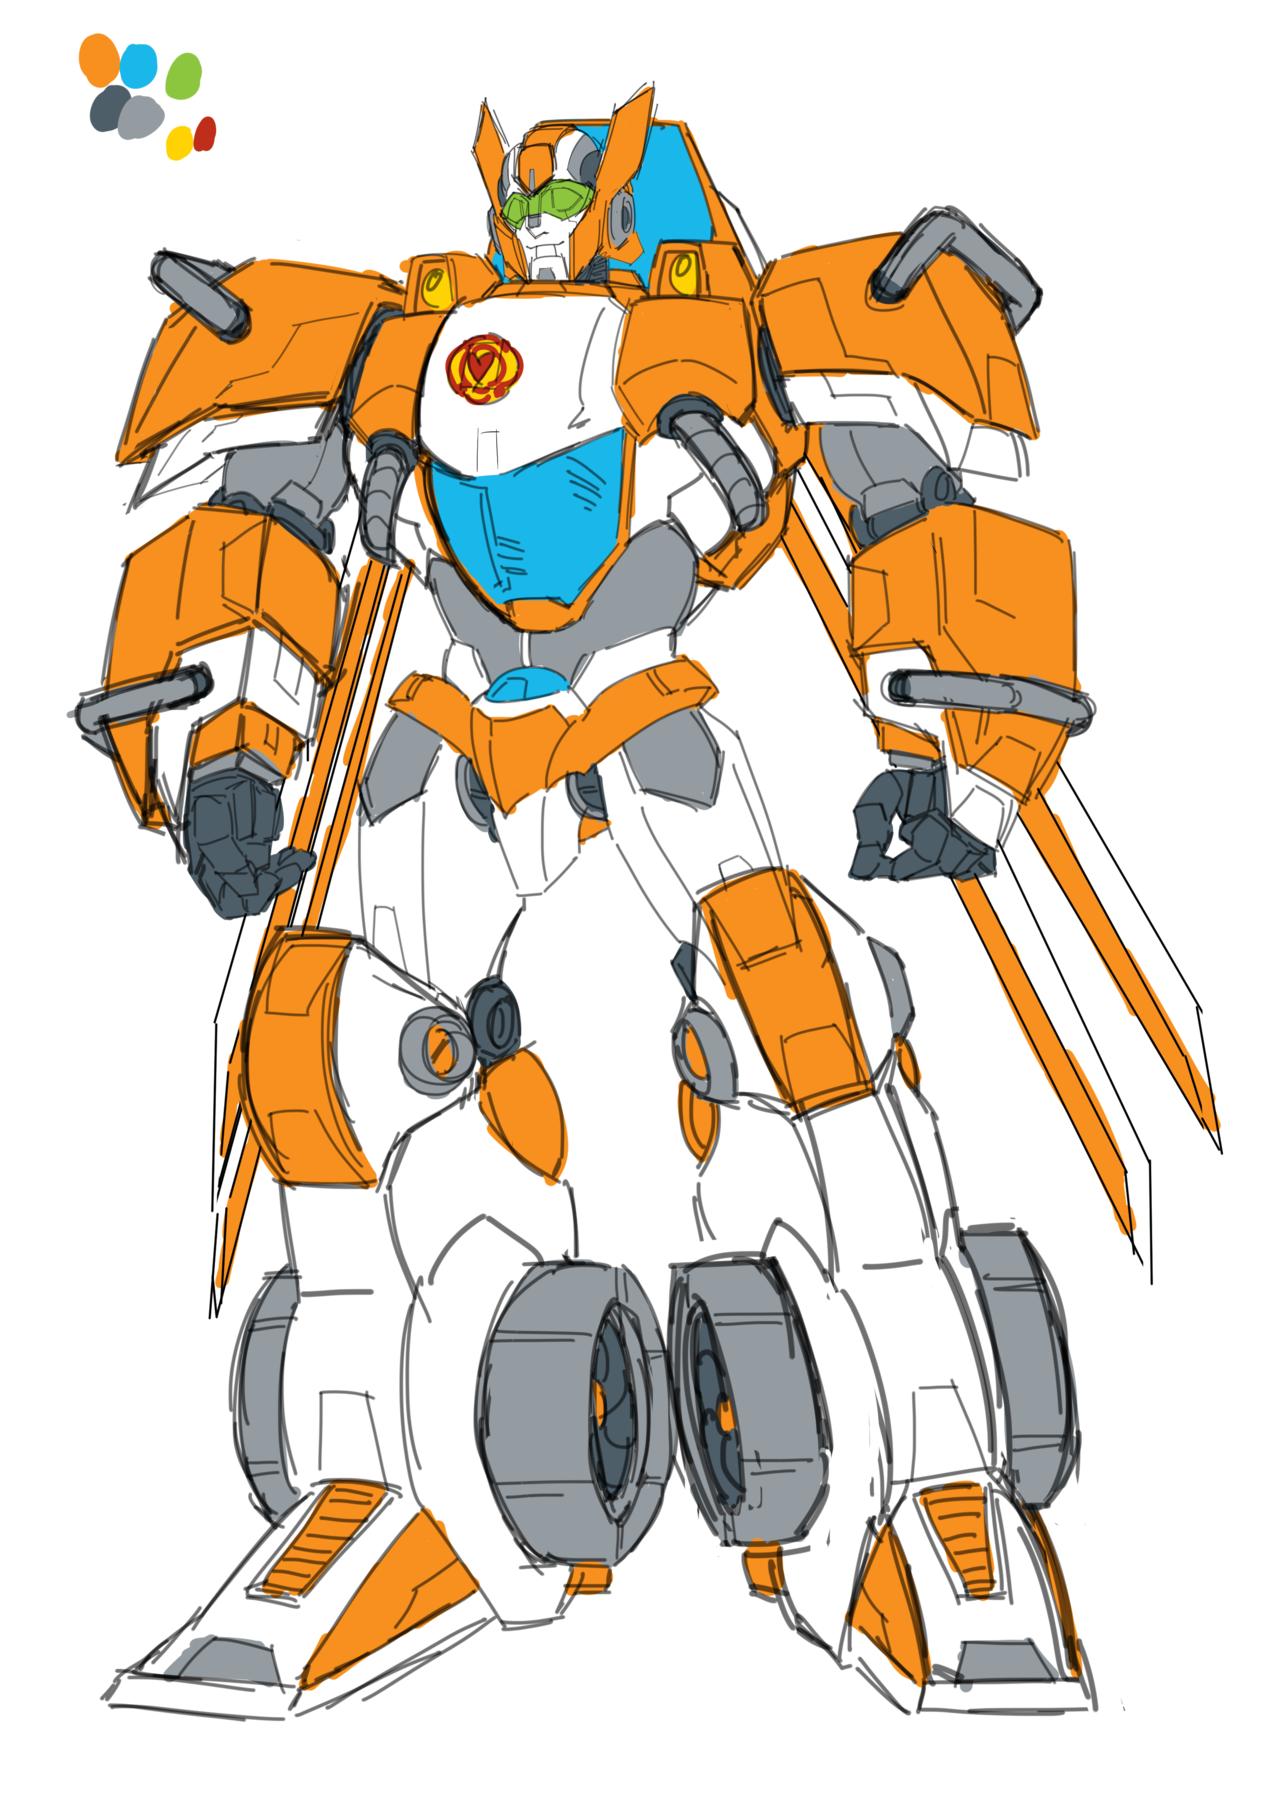 Blades | Transformers and robotics | Transformers funny